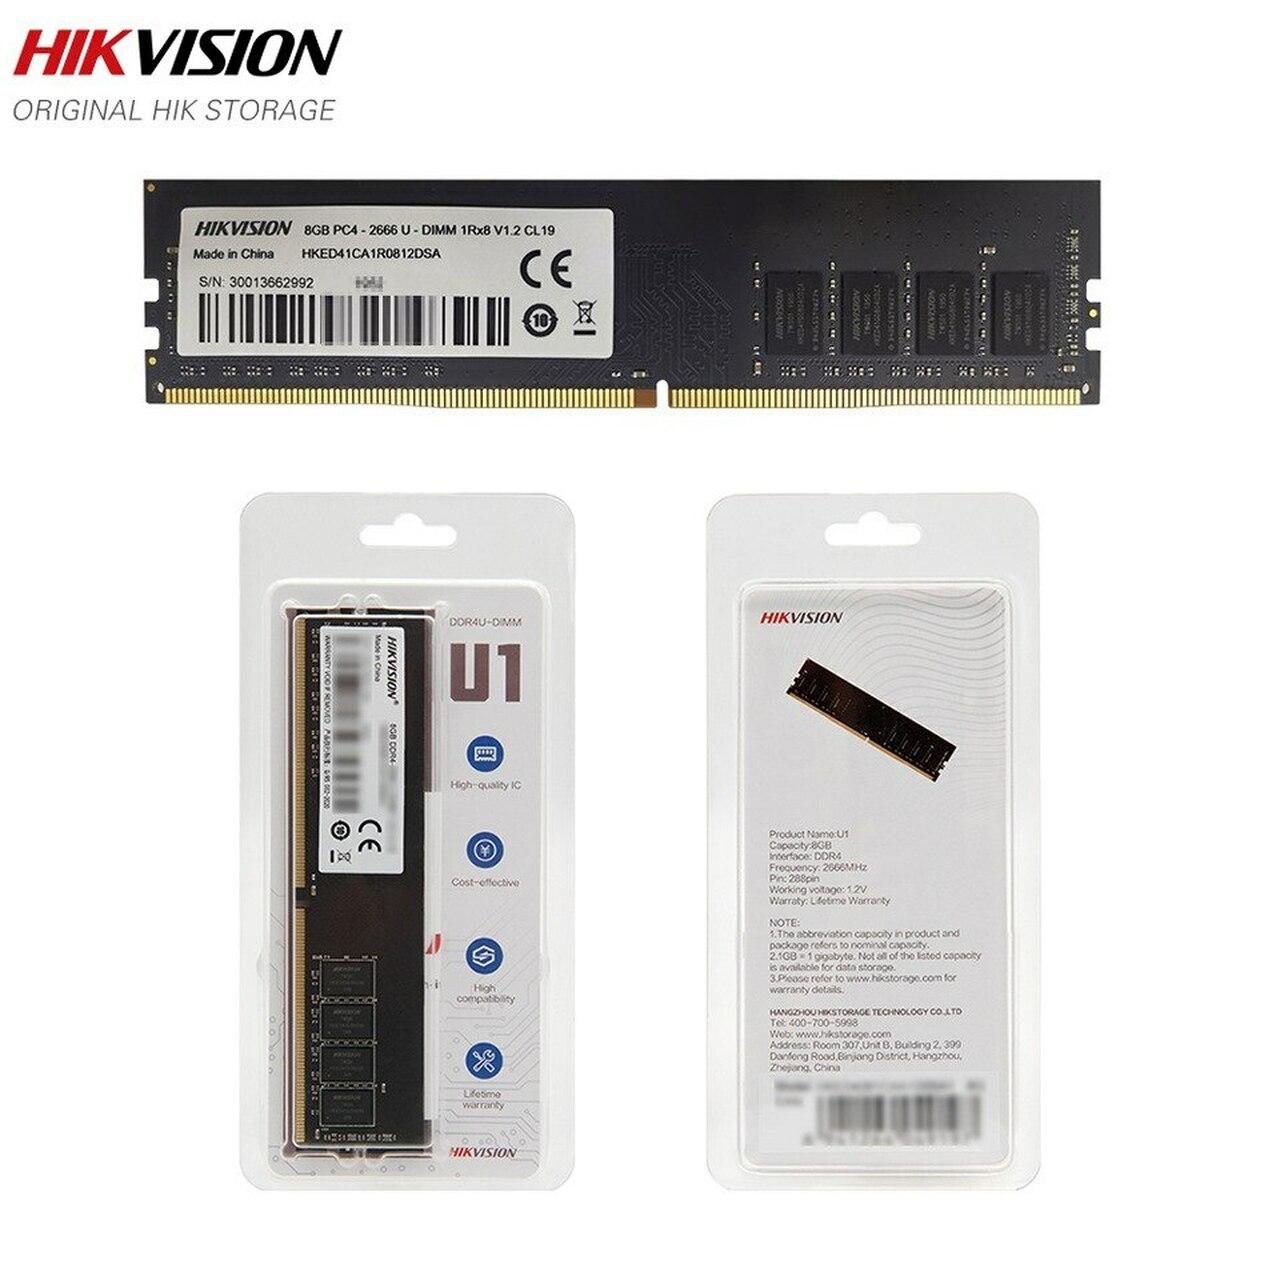 HIKVISION RAM 8GB/16GB DDR4 2666MHz - For Desktop | AYOUB COMPUTERS |  LEBANON